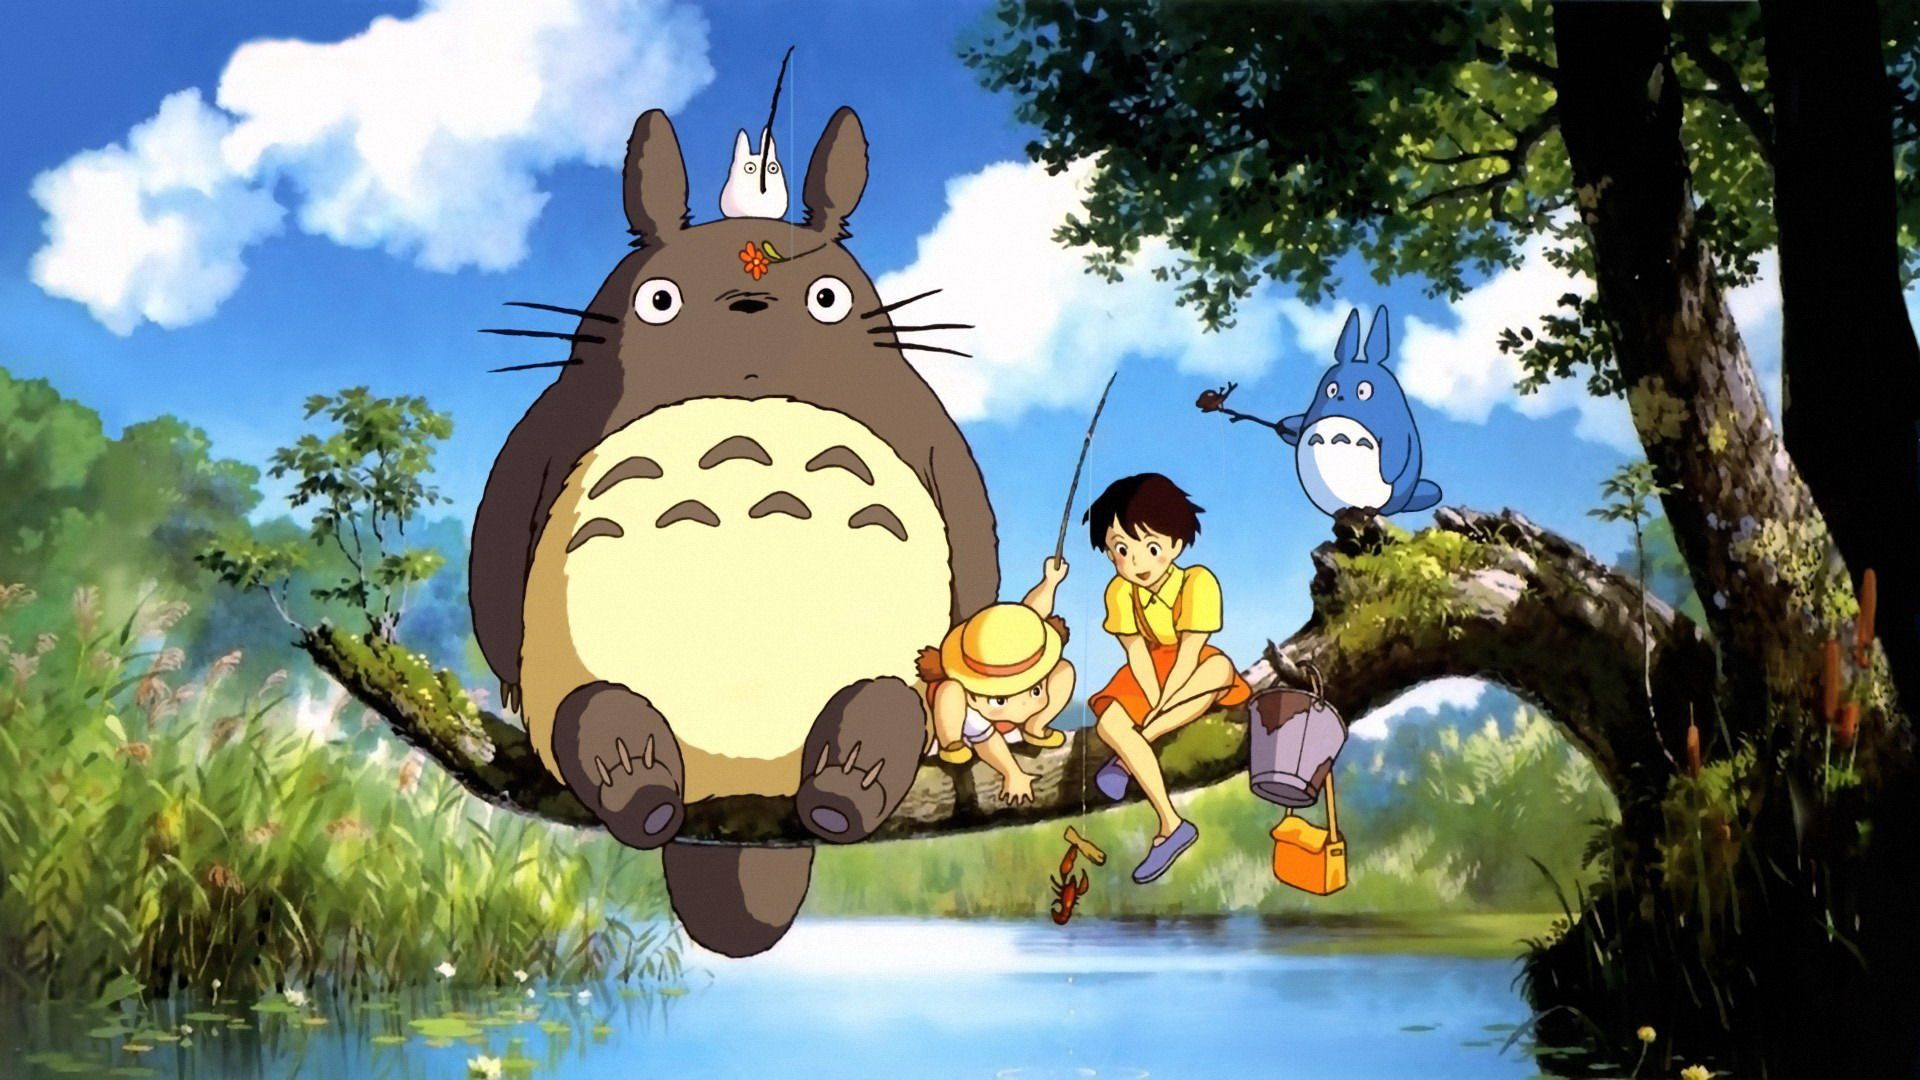 My Neighbor Totoro This Film Changed My Life Ghibli